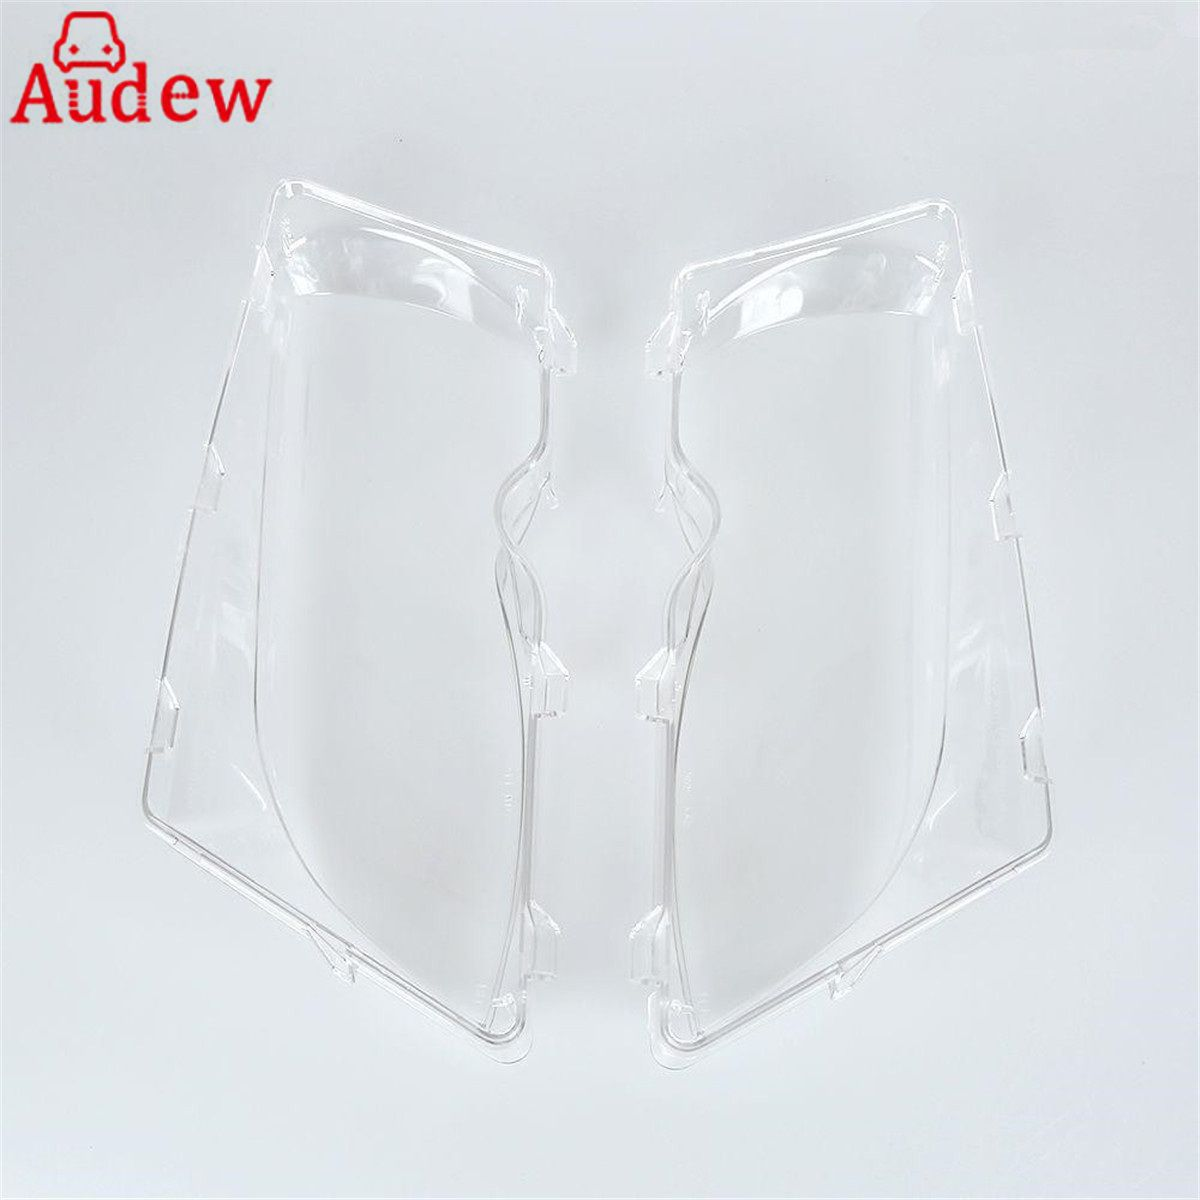 2 Pcs Car Lights Headlight Shell  Lamp Cover Glass Replacement Lens For BMW E46 318i/320i/ 325i/ 325xi/ 330i/330xi (2002-2005)